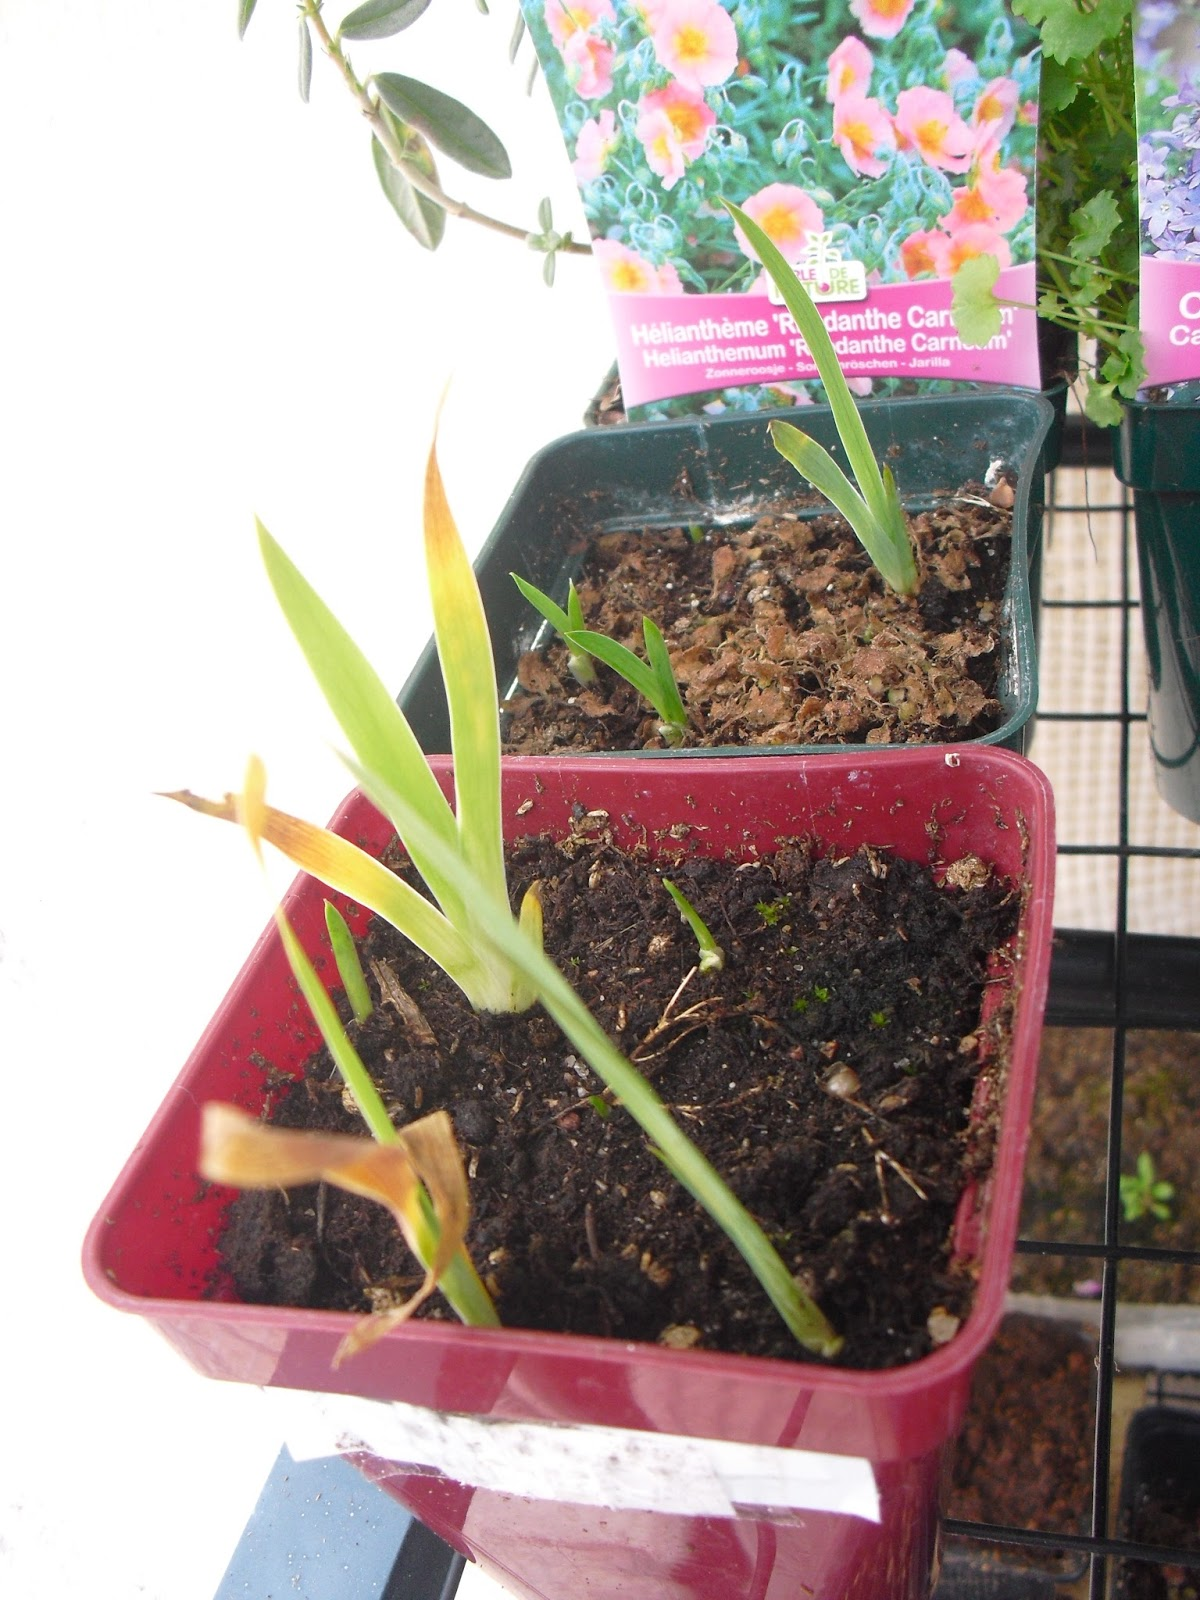 mon petit jardin en sologne les semis fin mars. Black Bedroom Furniture Sets. Home Design Ideas